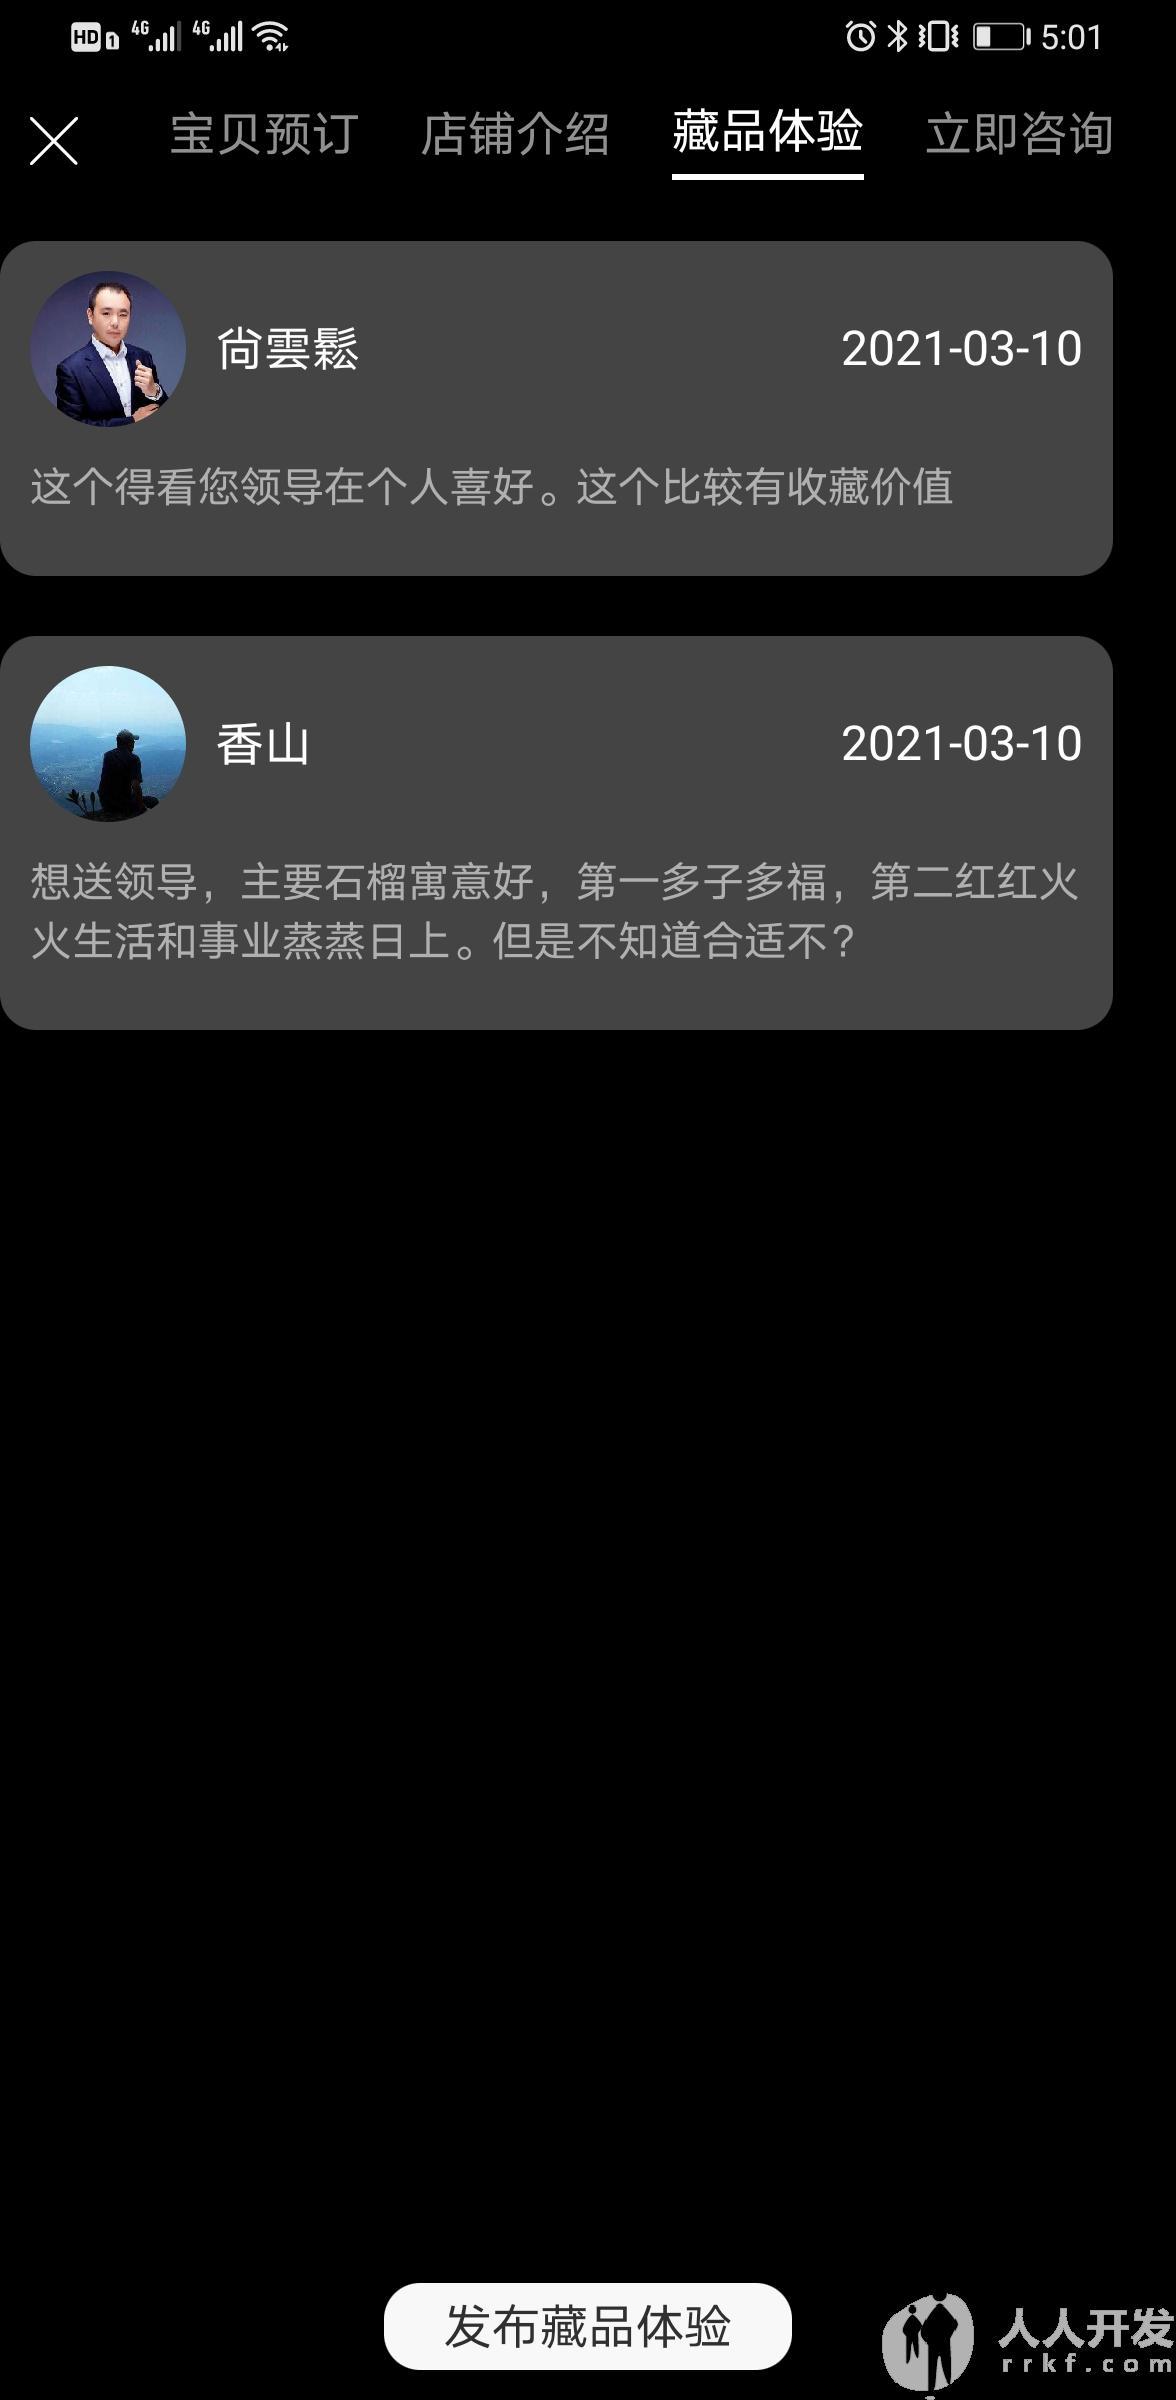 Screenshot_20210423_170157_com.yiyuanyoudao.app.jpg